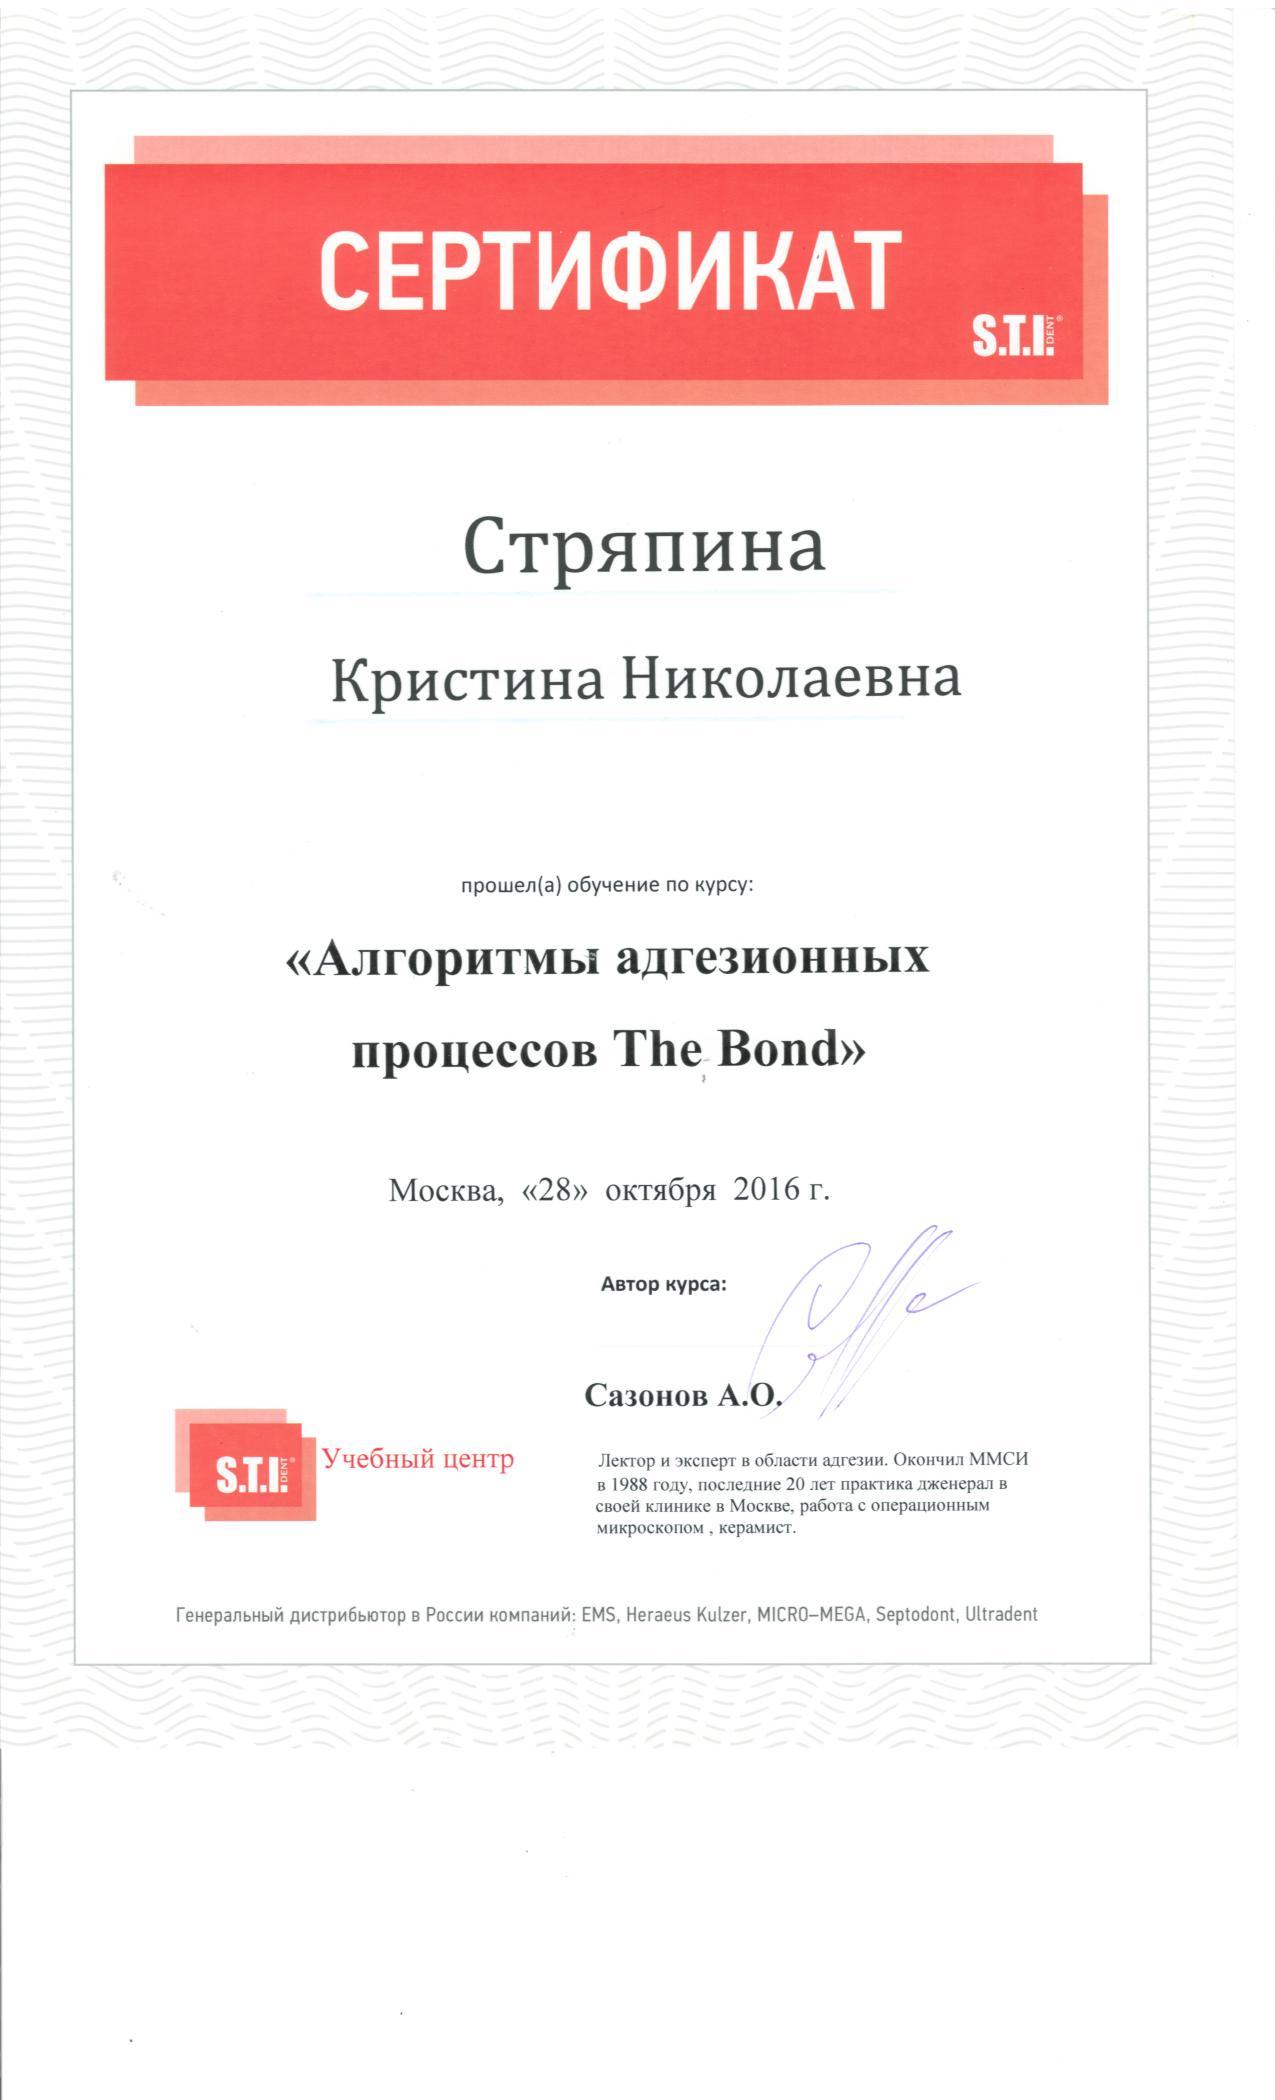 Сертификат Стряпиной Кристины (28.10.2016)